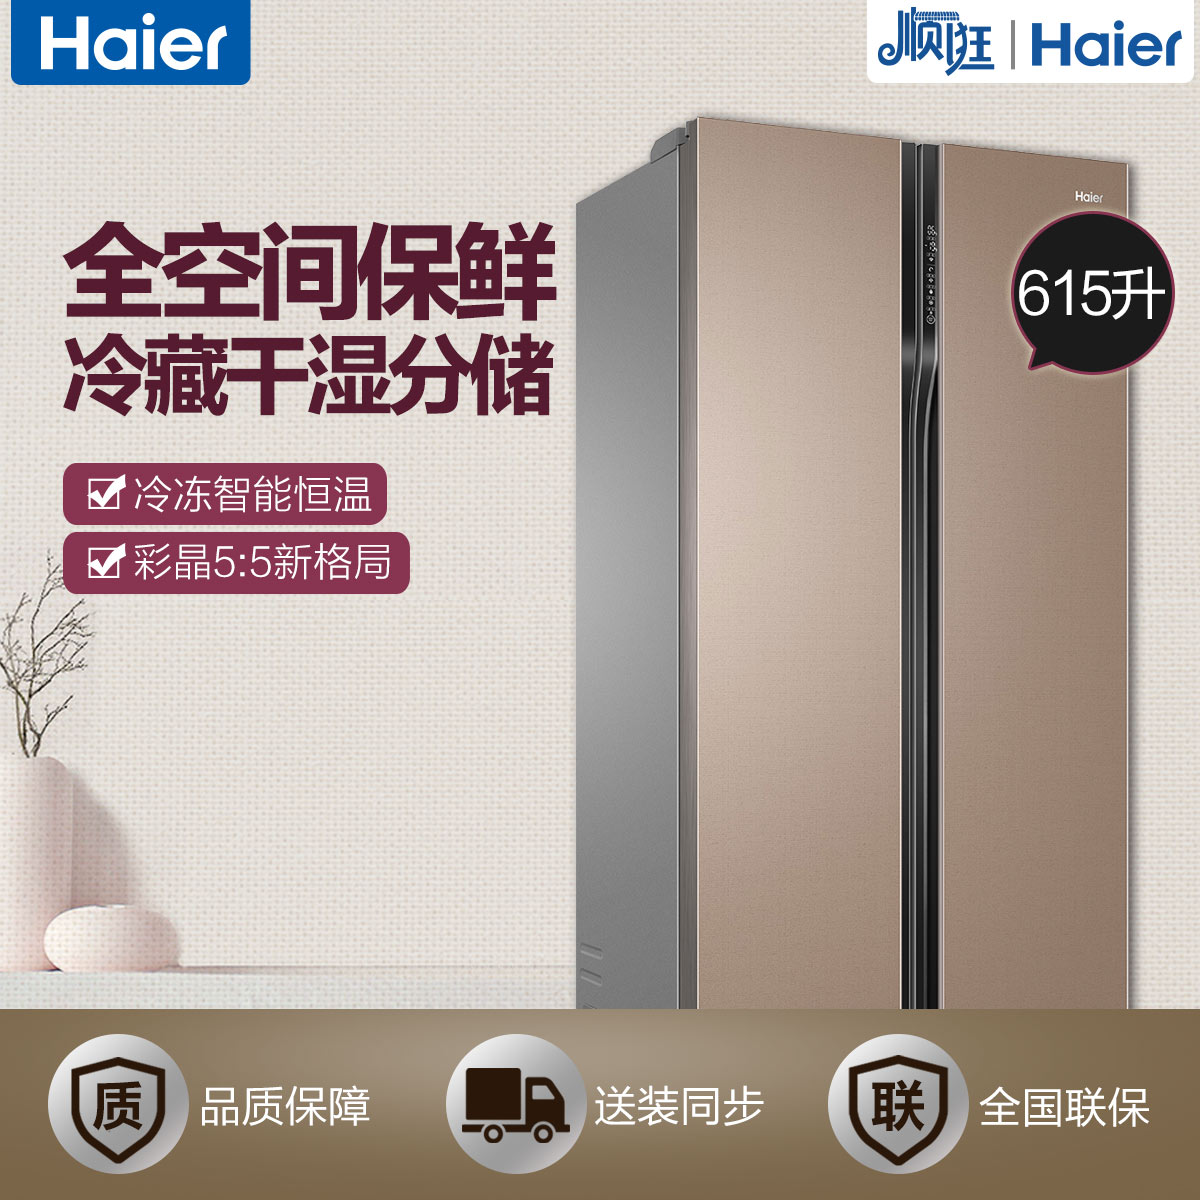 Haier/海尔             冰箱             BCD-615WDCZ